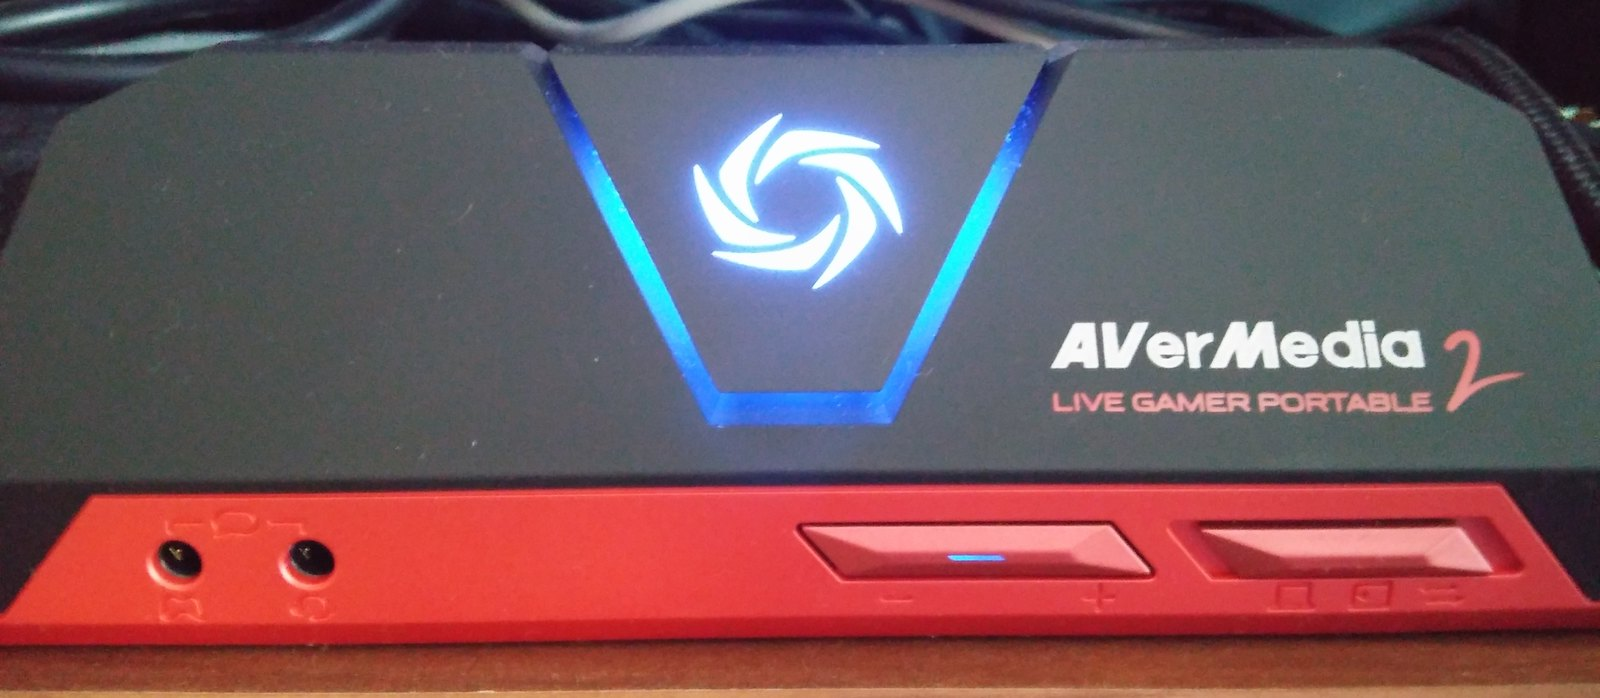 AVerMedia Live Gamer Portable 2 an